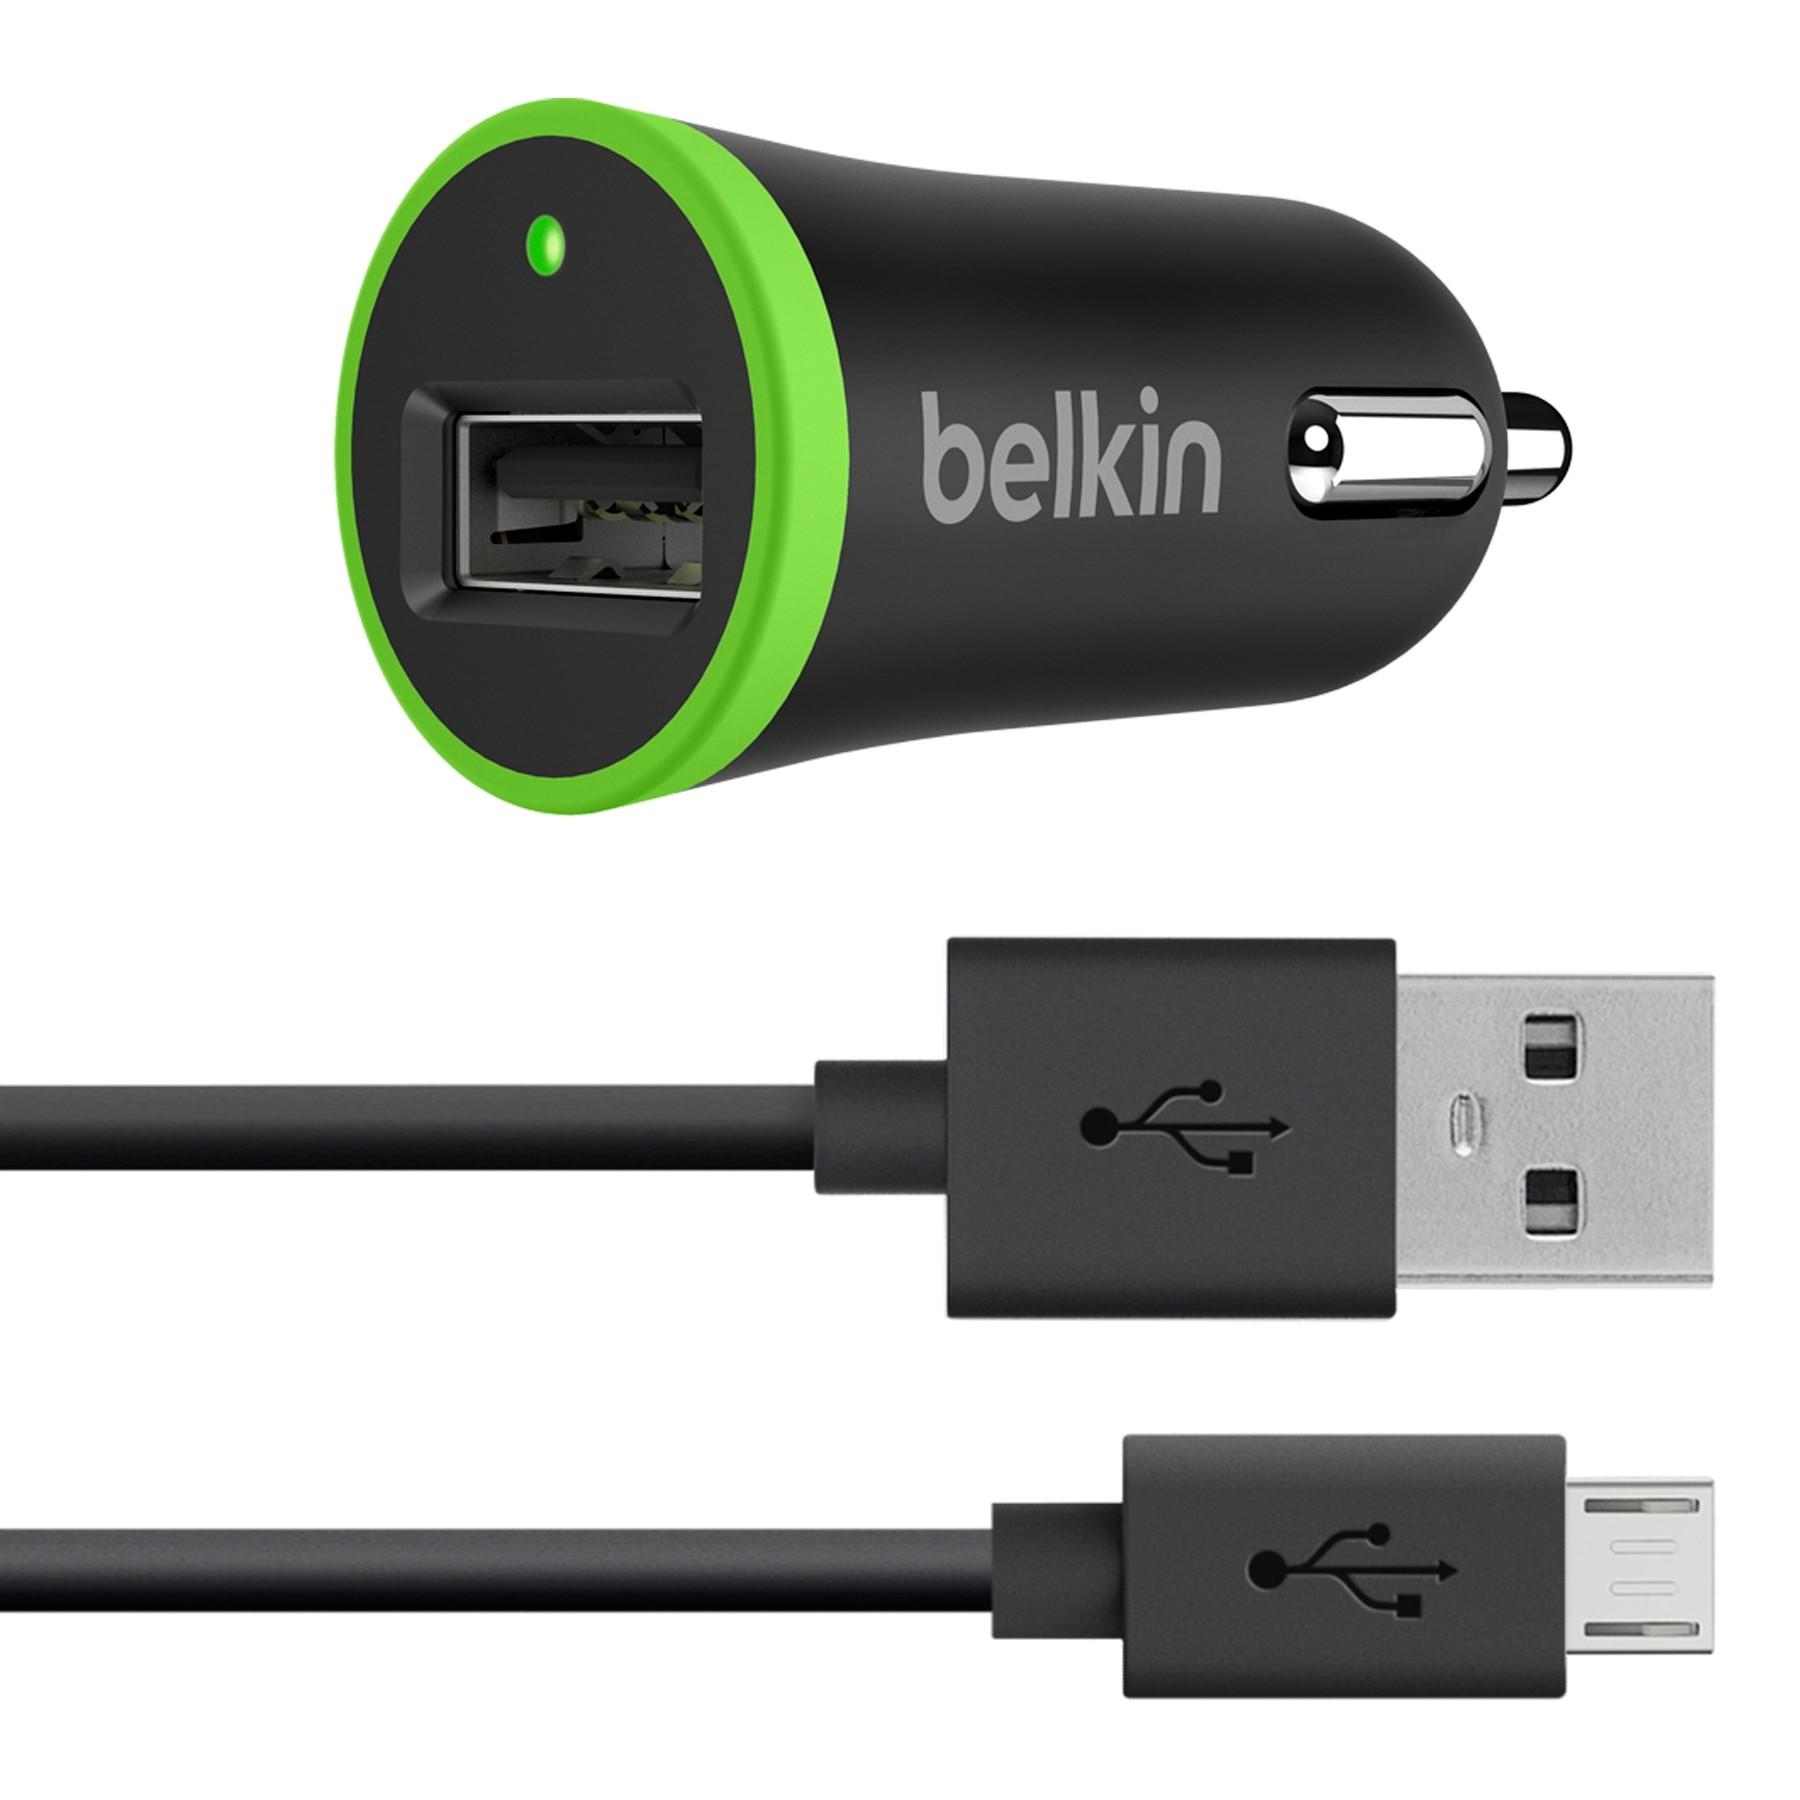 94ce8c524dd Cargador BELKIN, carro Negro Micro USB 2.1 Ktronix Tienda Online